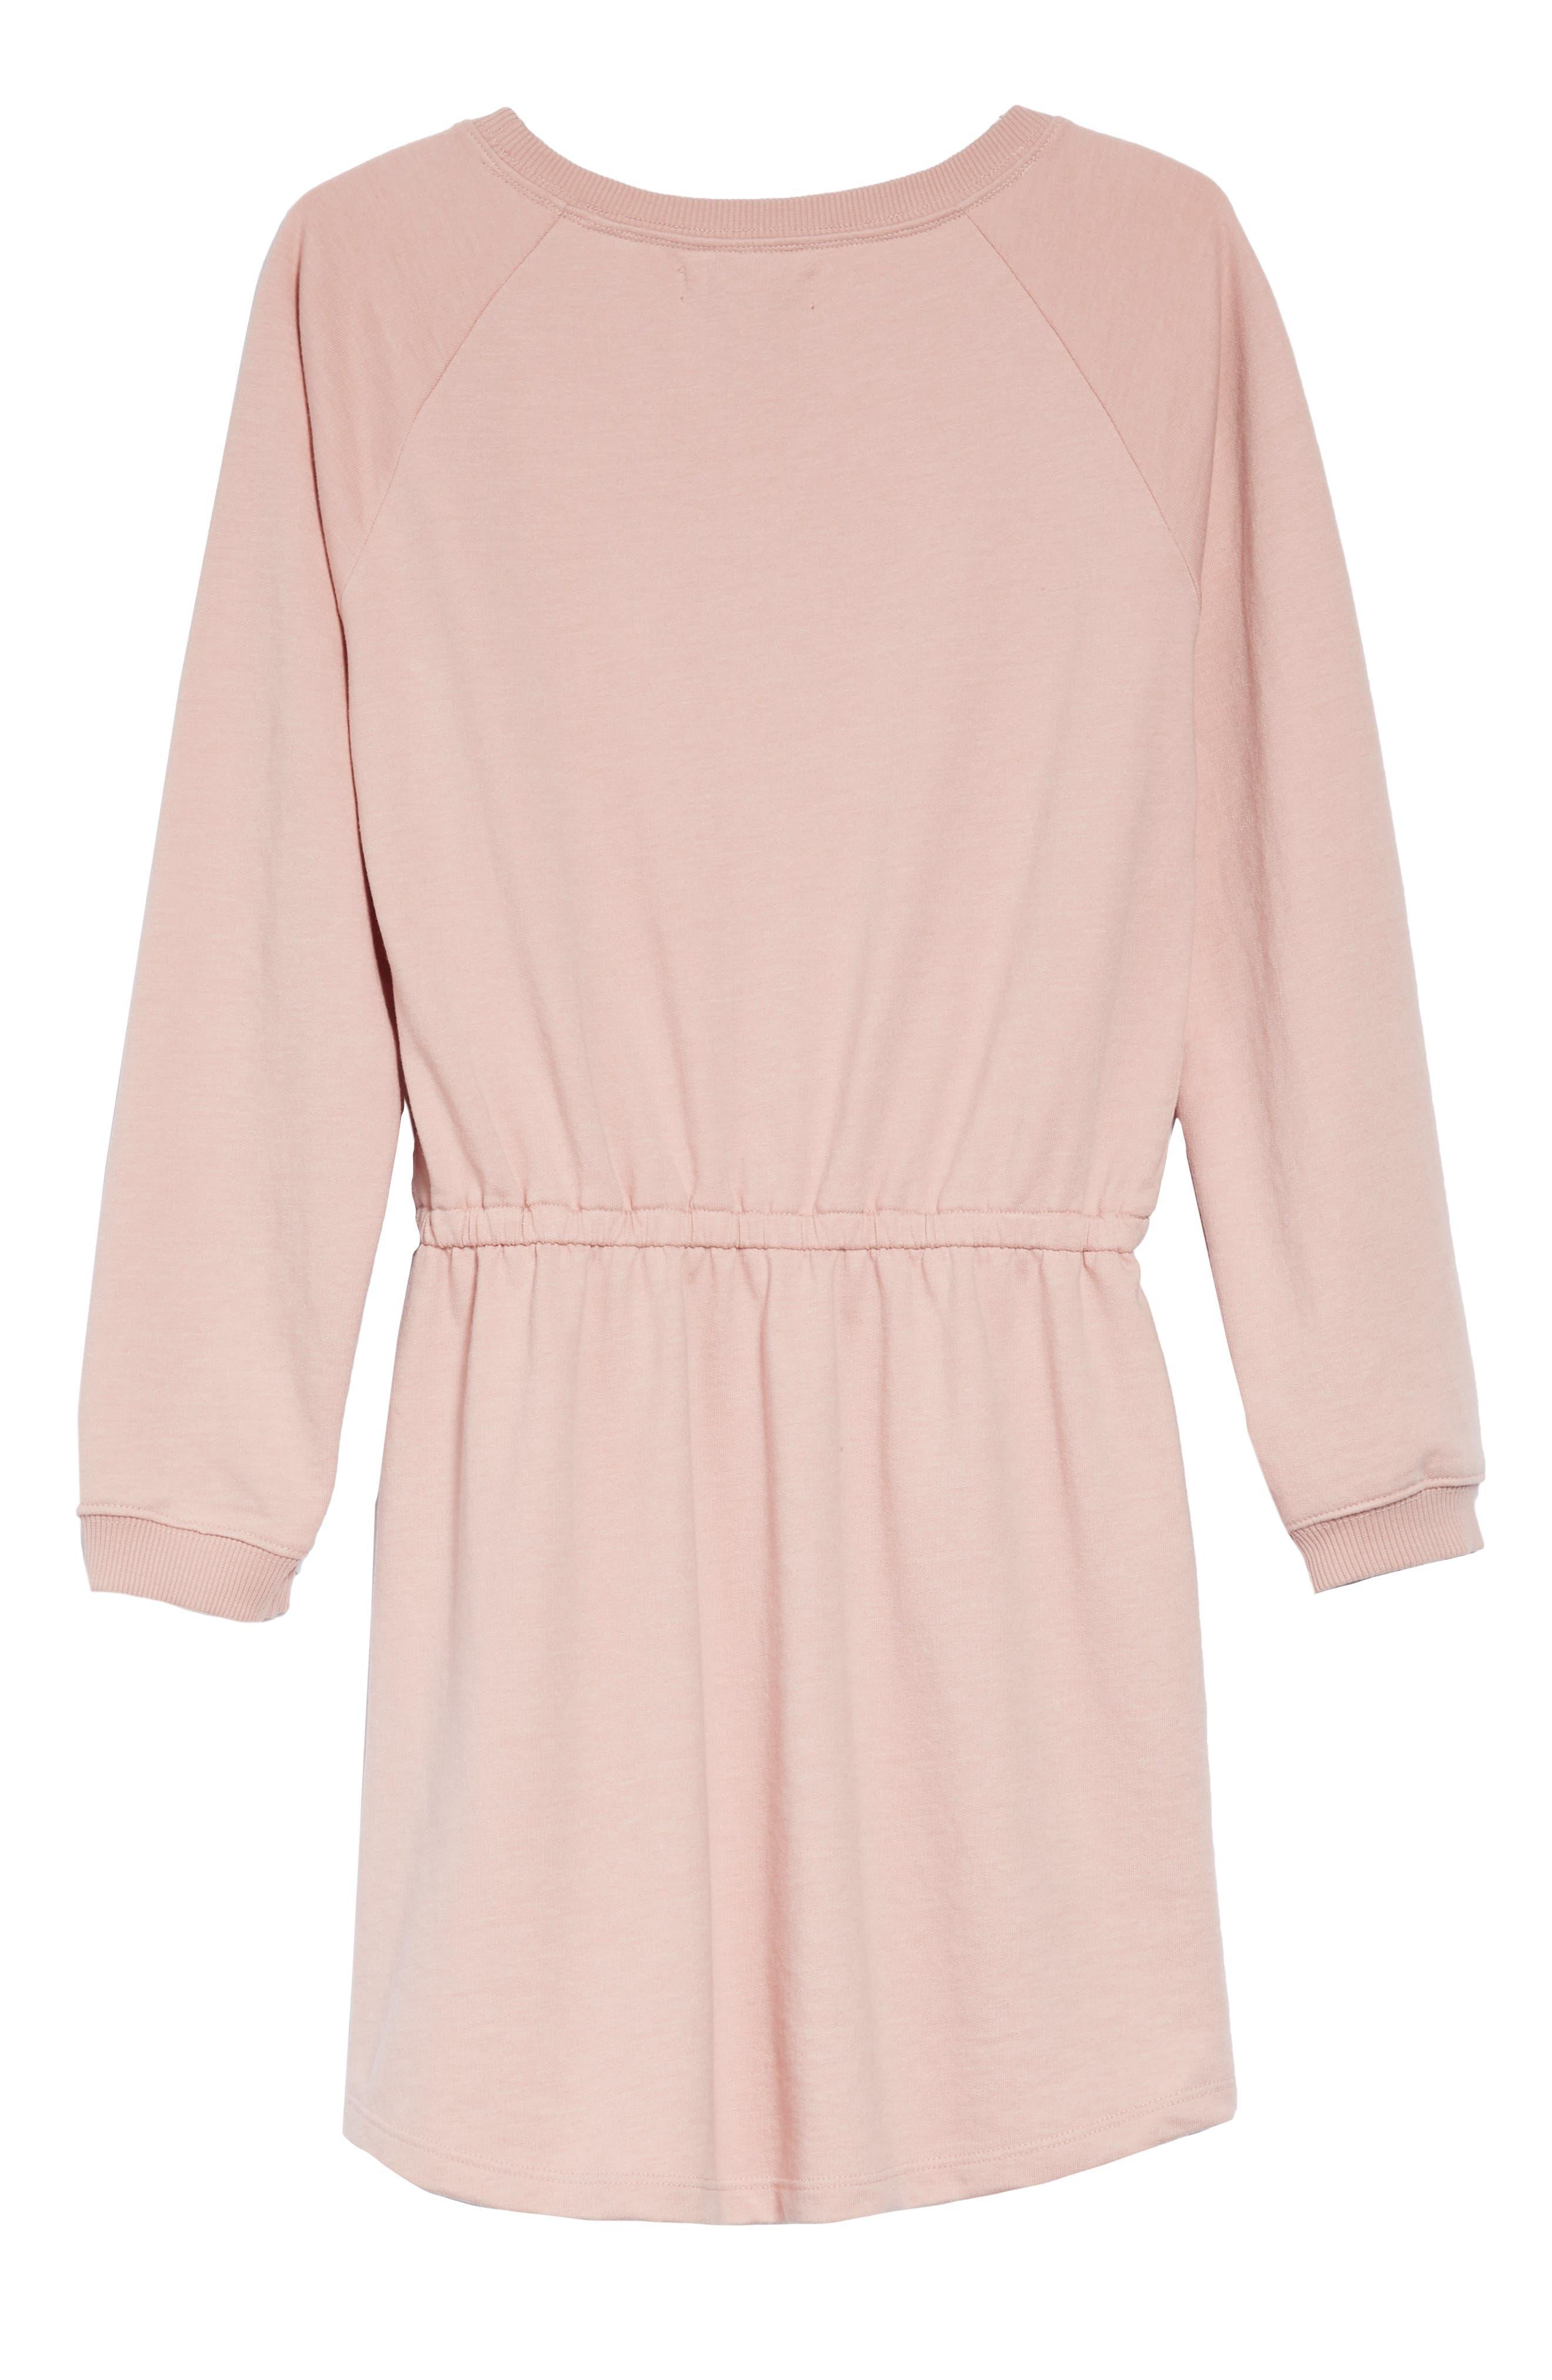 Hello Tassel Dress,                             Alternate thumbnail 2, color,                             PINK